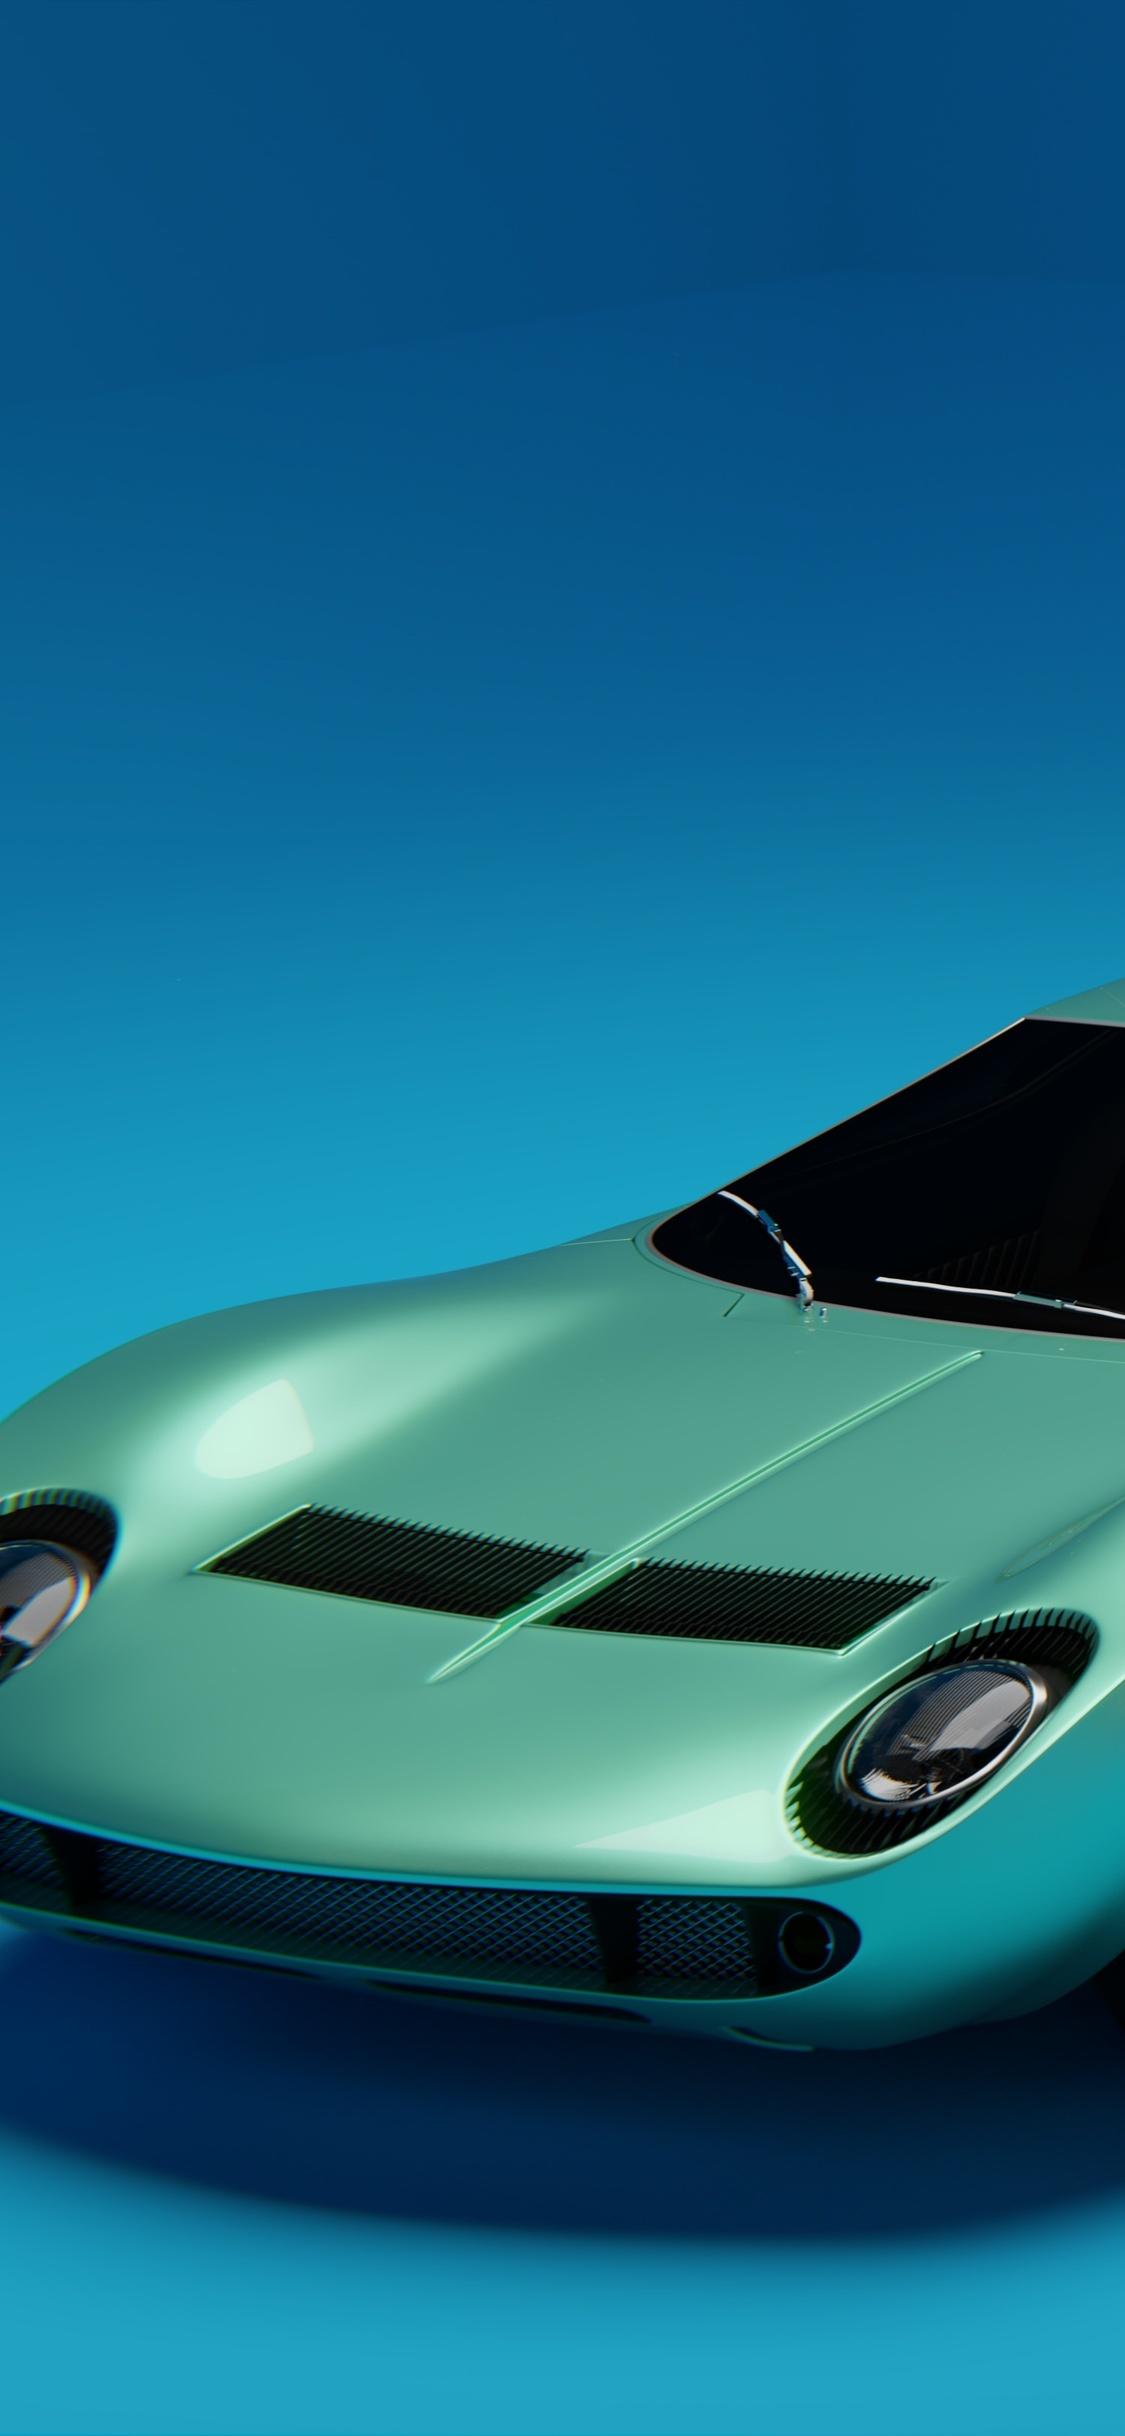 1125x2436 Lamborghini Miura Iphone Xs Iphone 10 Iphone X Hd 4k